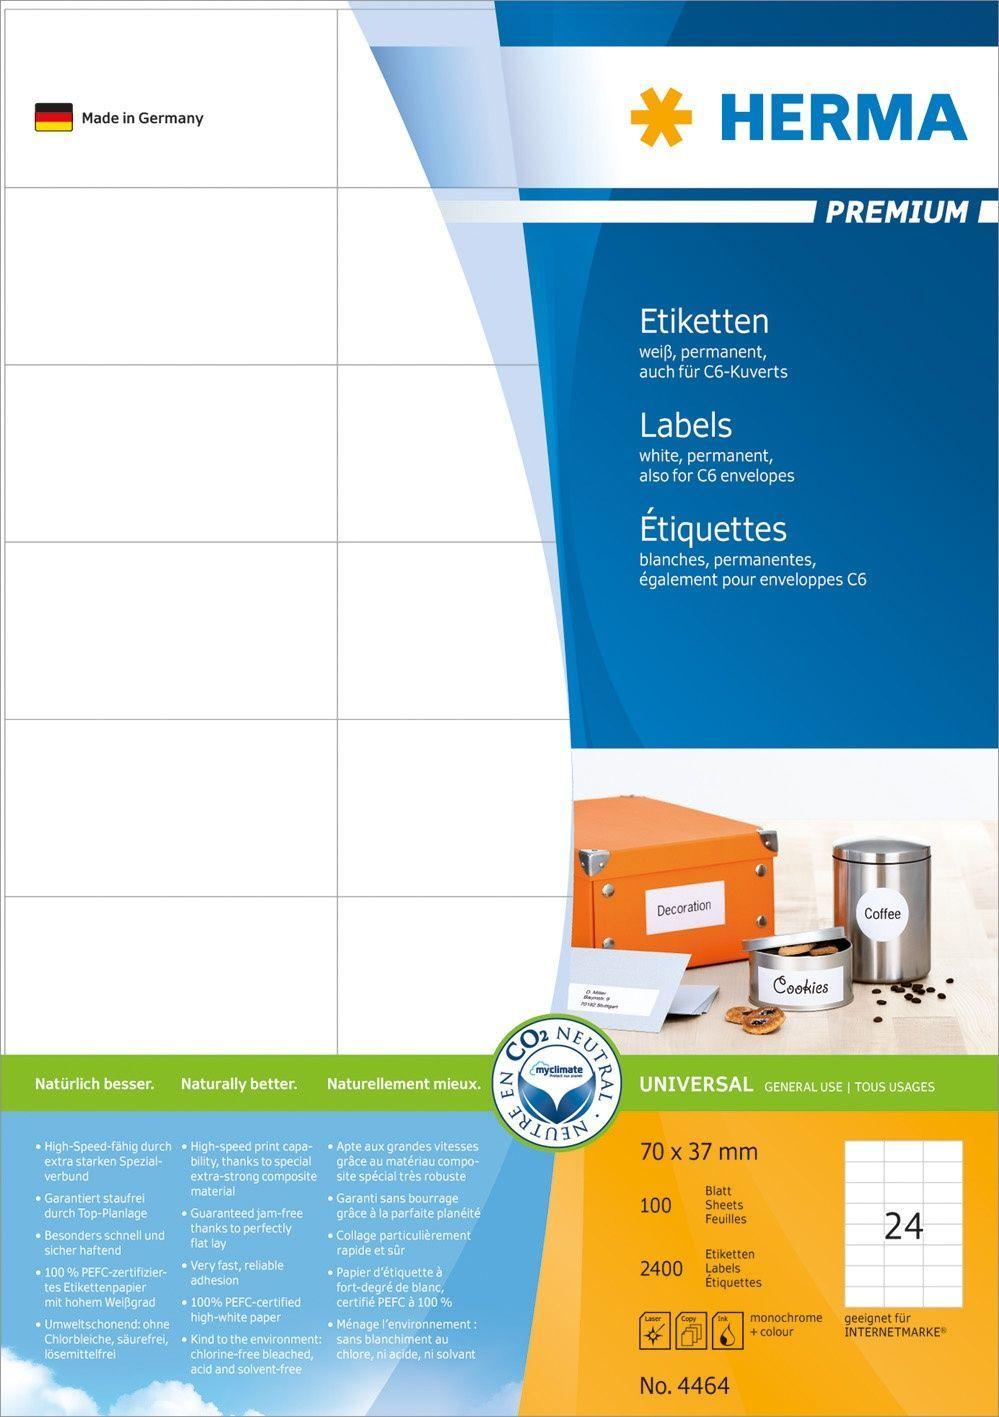 Herma Etikett premium A4 70x37mm (2400) Y450061